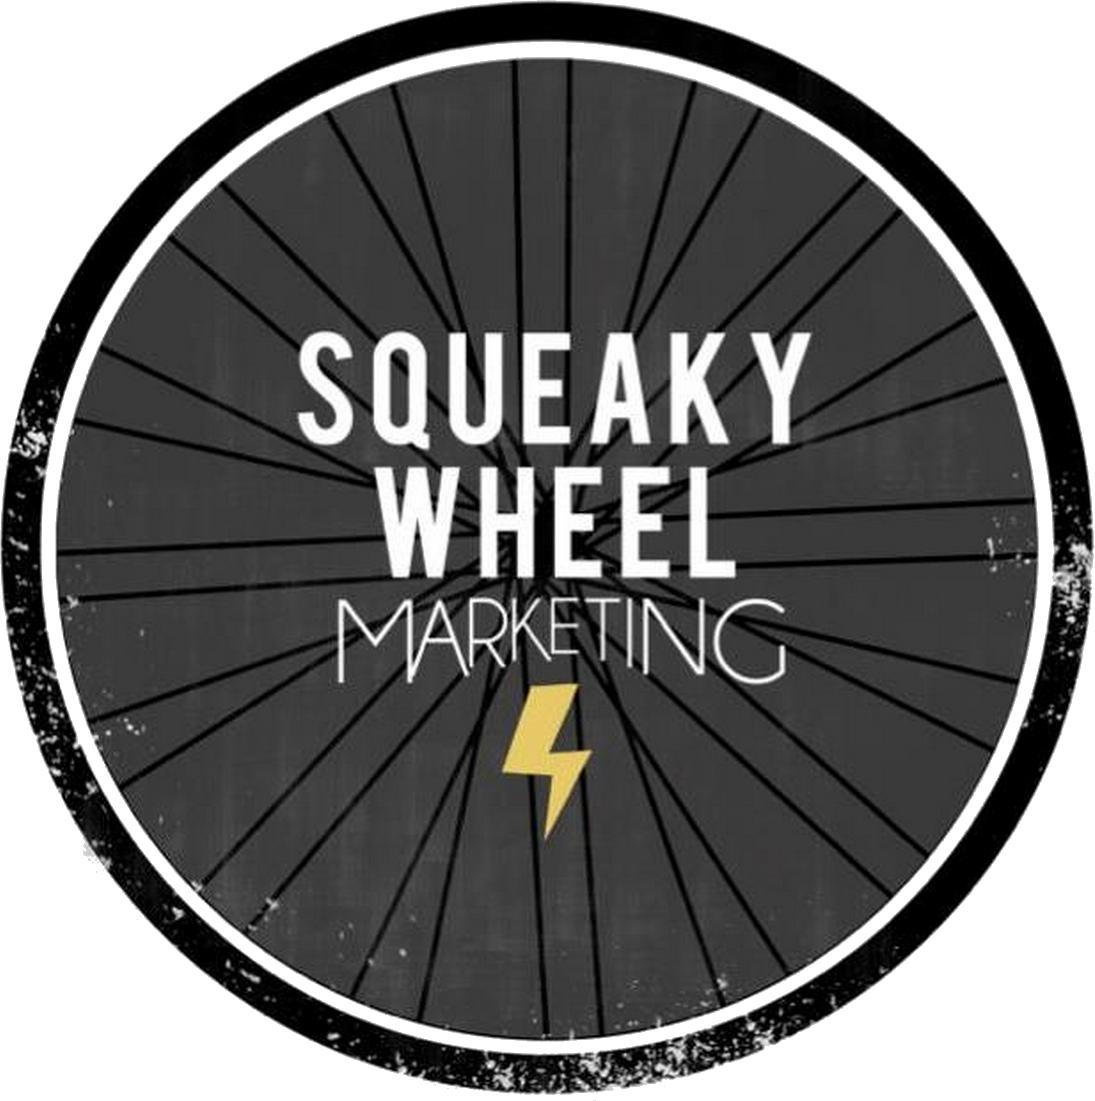 Squeaky Wheel Marketing Transparent logo